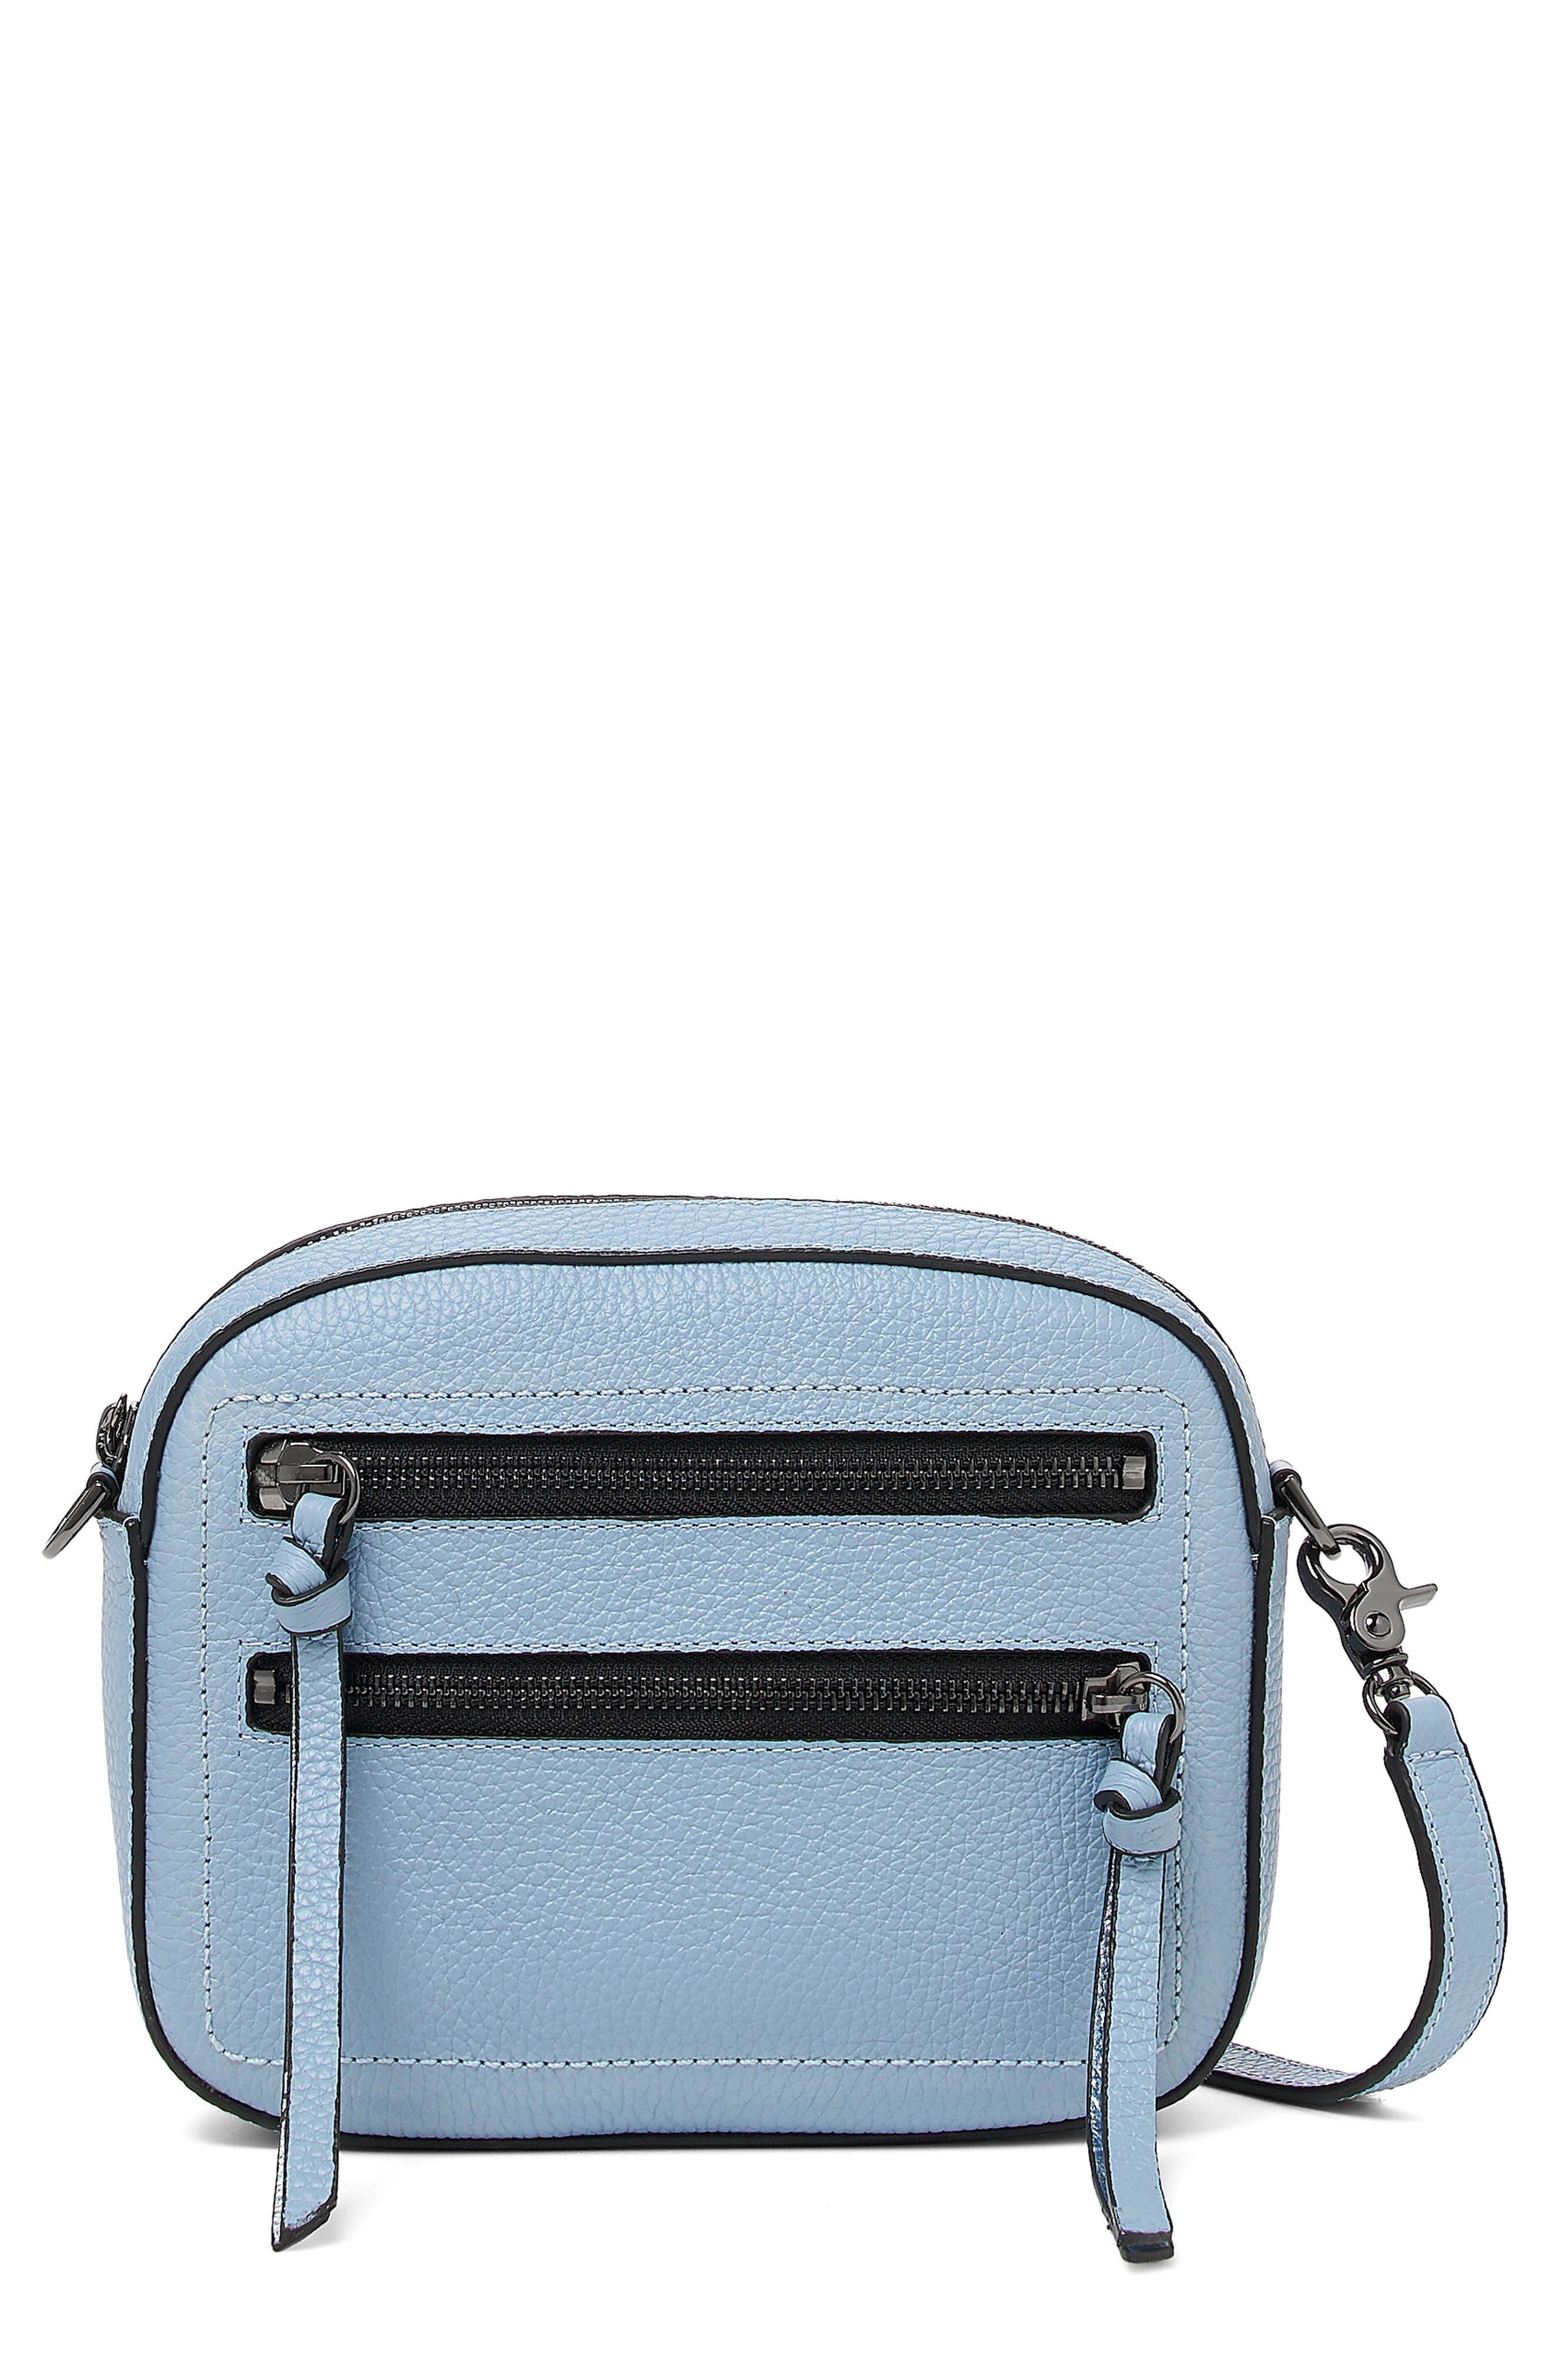 Chelsea Leather Crossbody Camera Bag